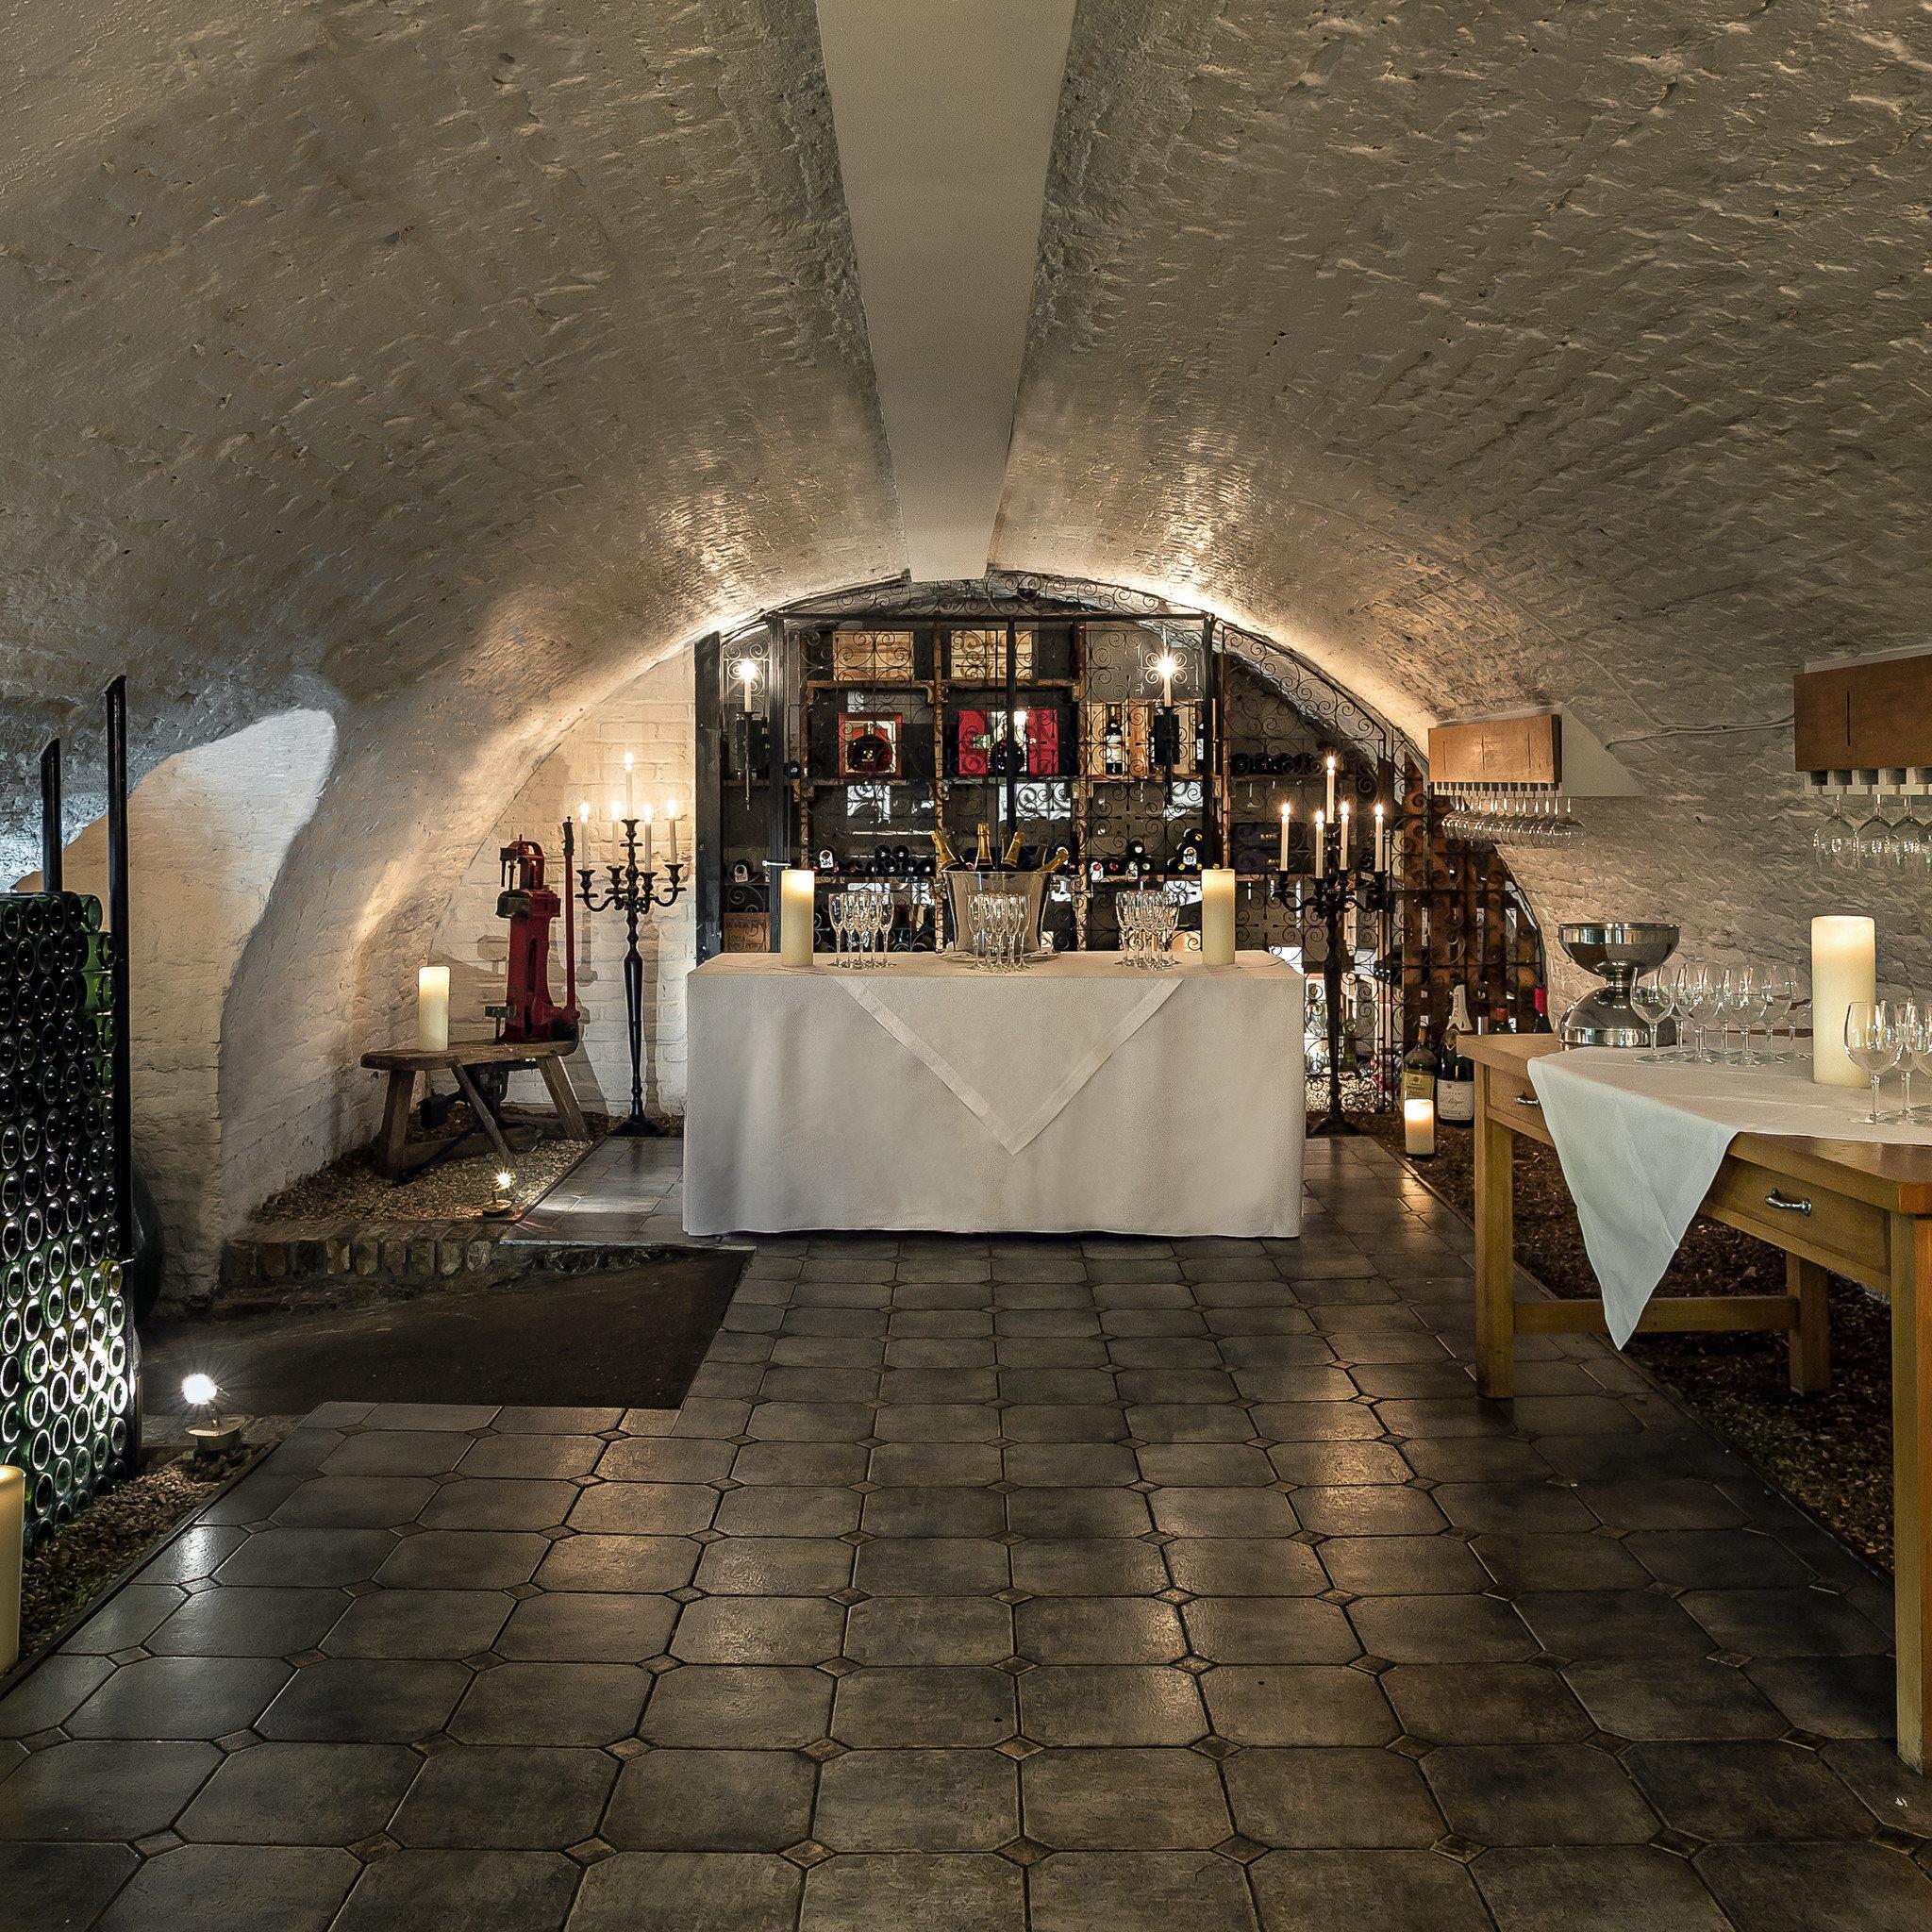 Bar Drink Resort Wine-Tasting ground building Lobby Architecture tourist attraction basement